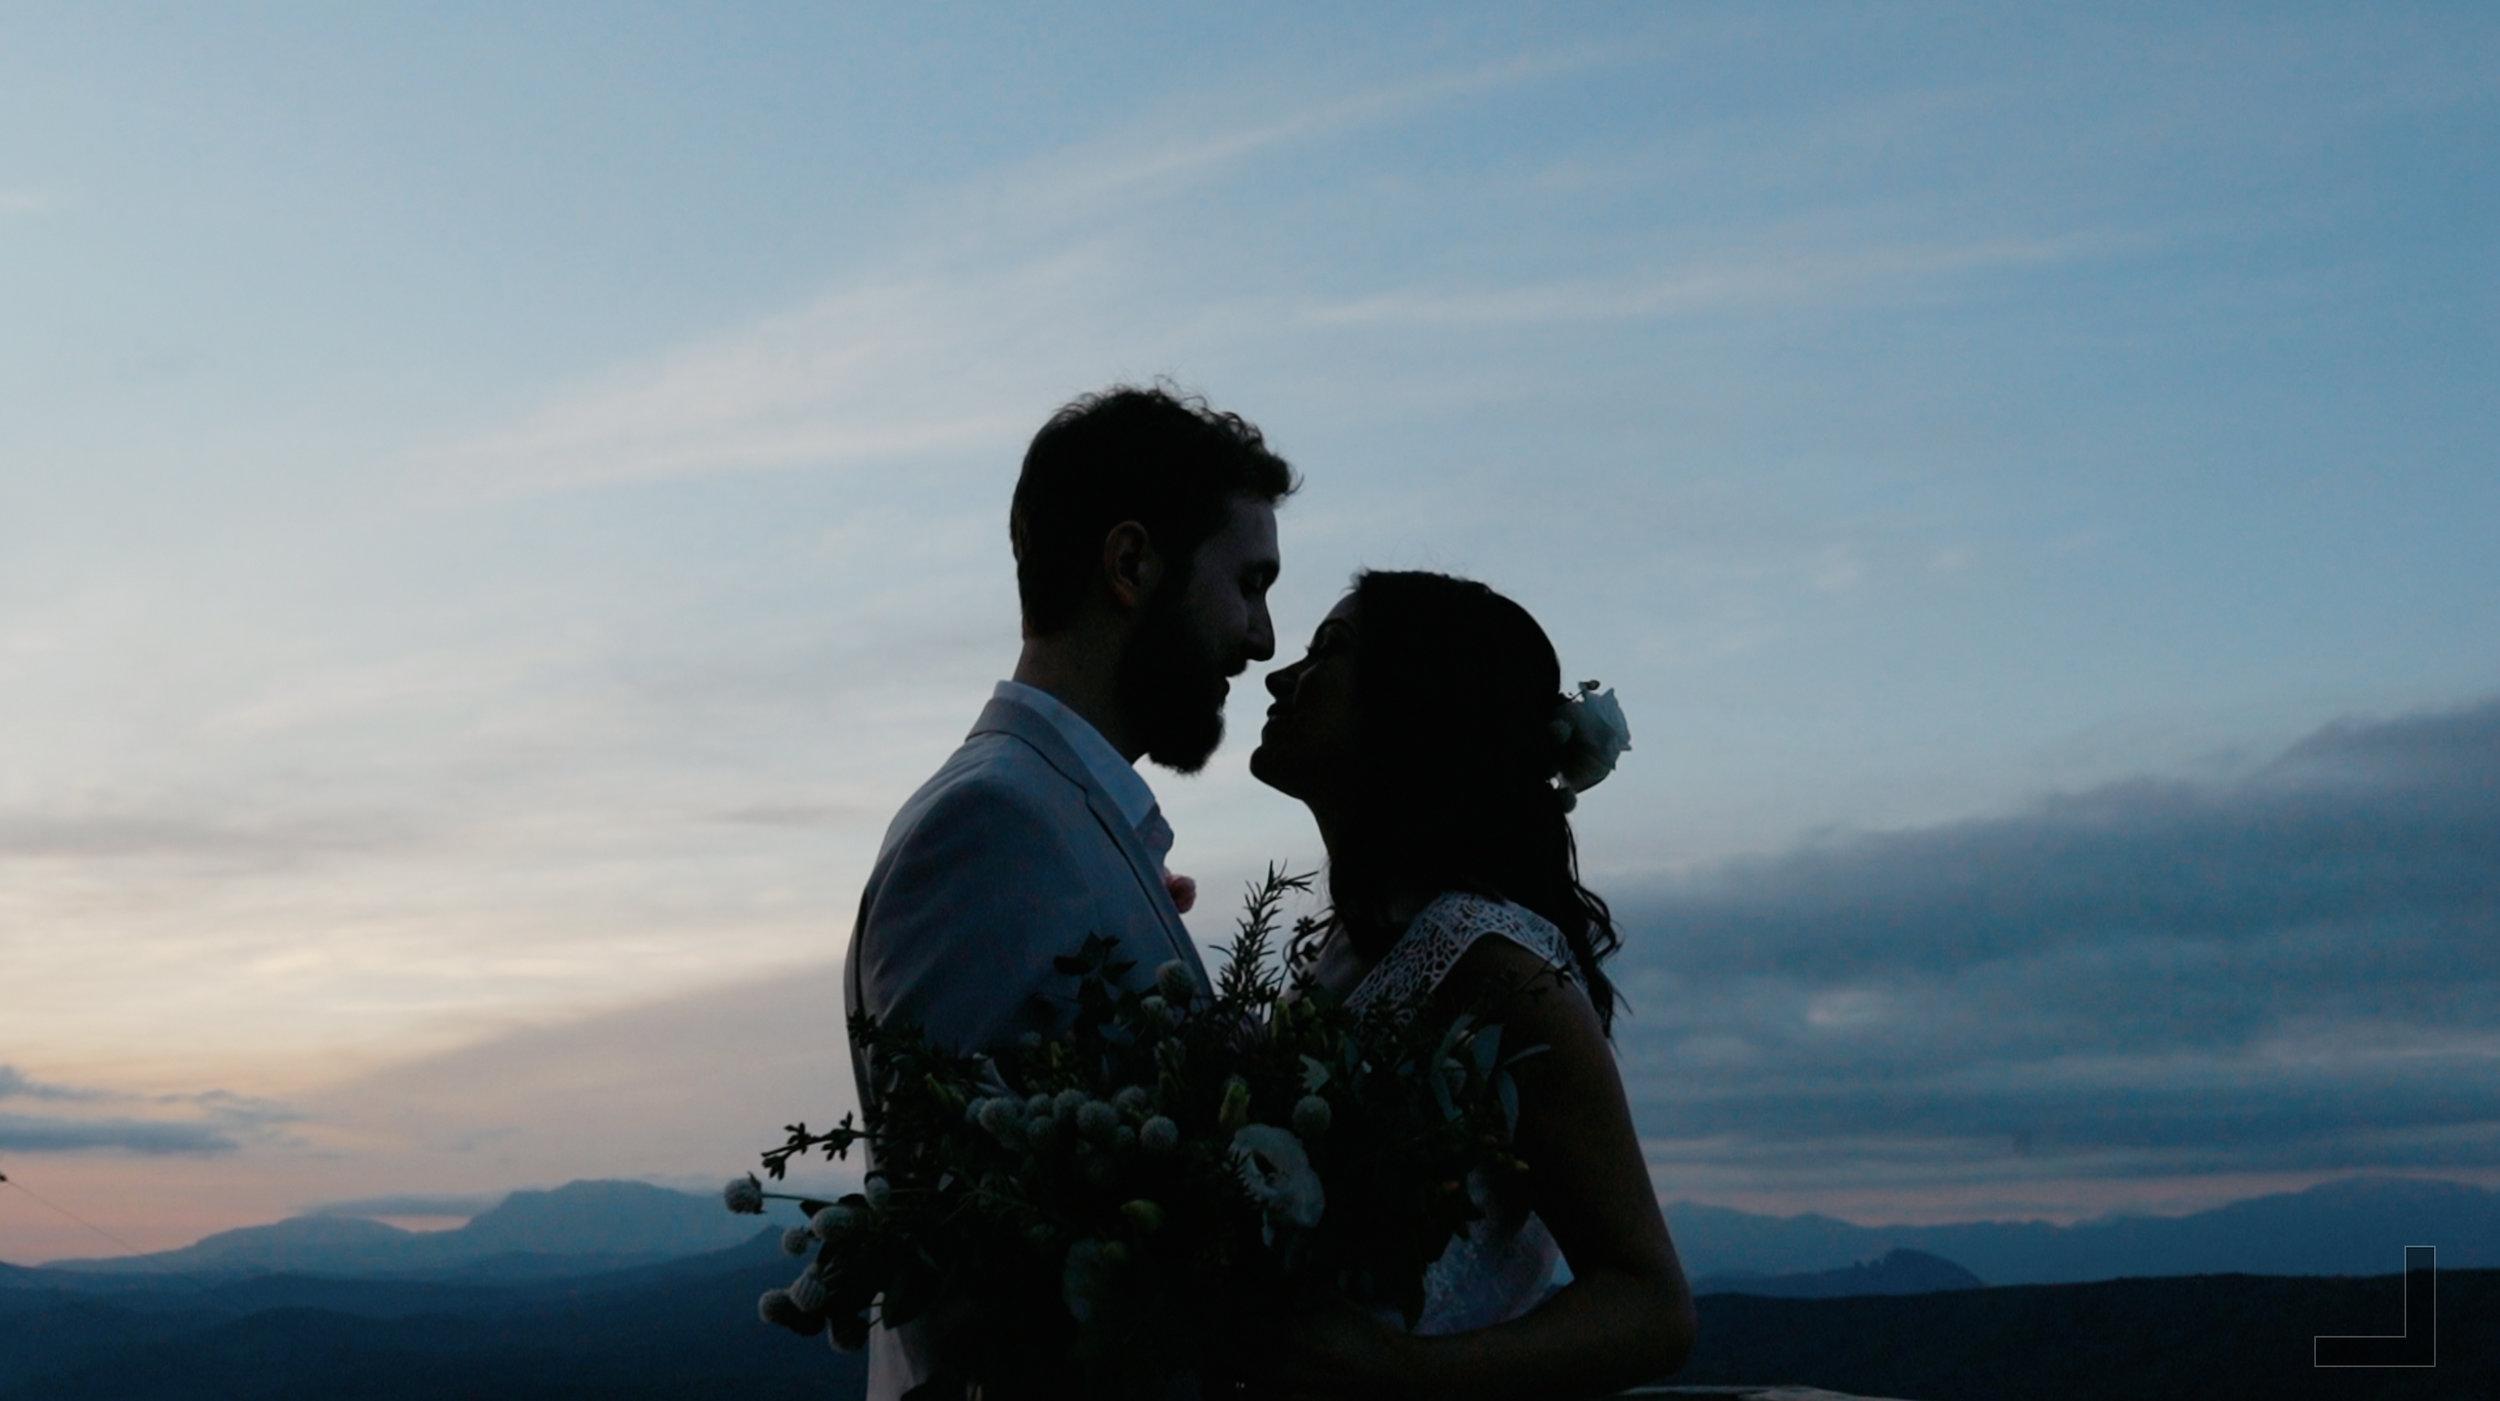 photographe-bruxelles-mariage-nicolasleleu2.jpg